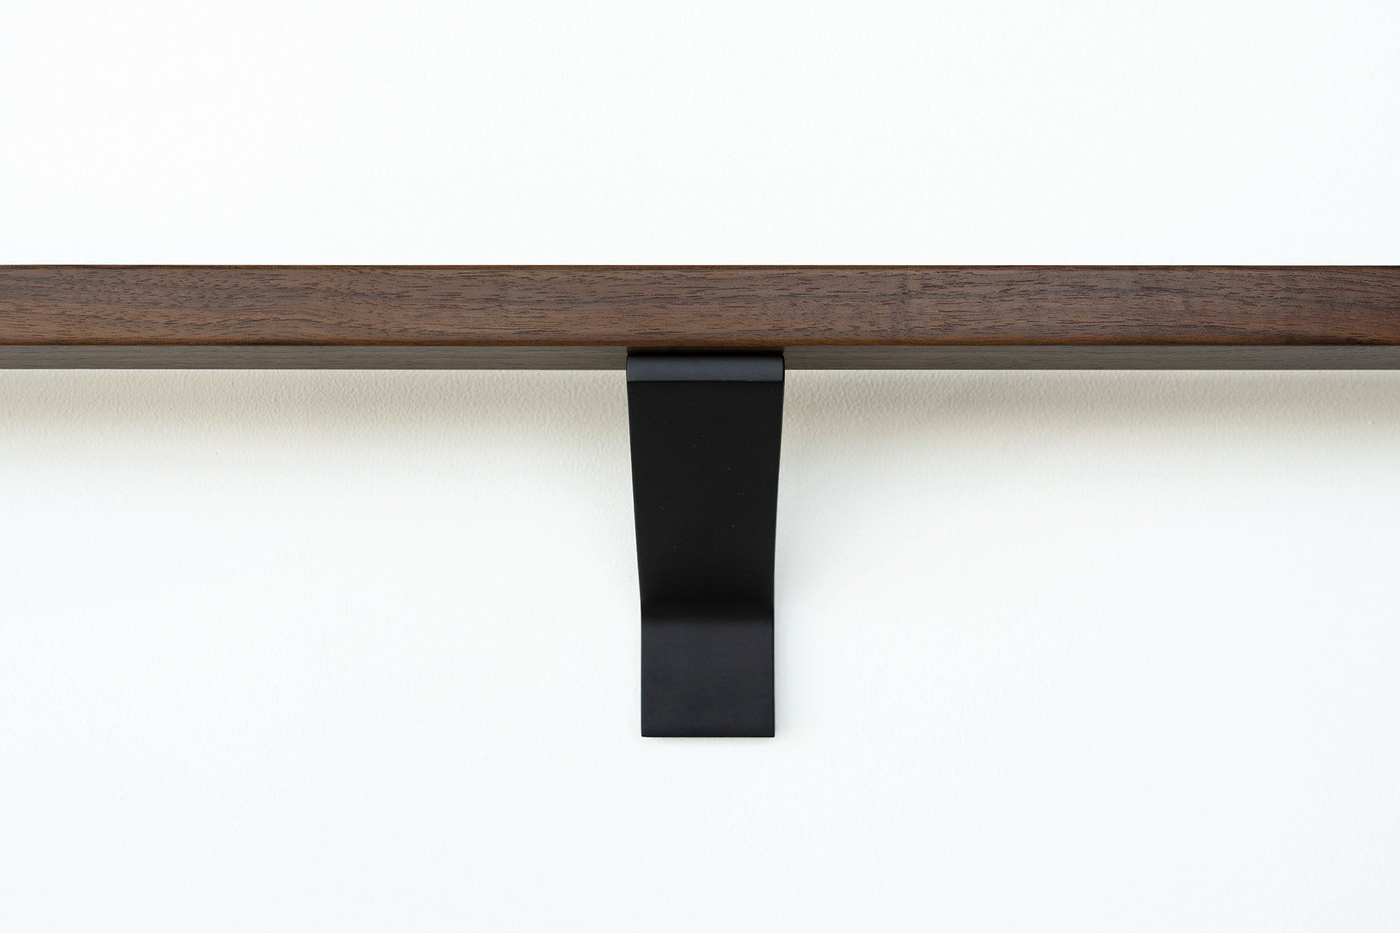 Black-modern-handrail-bracket